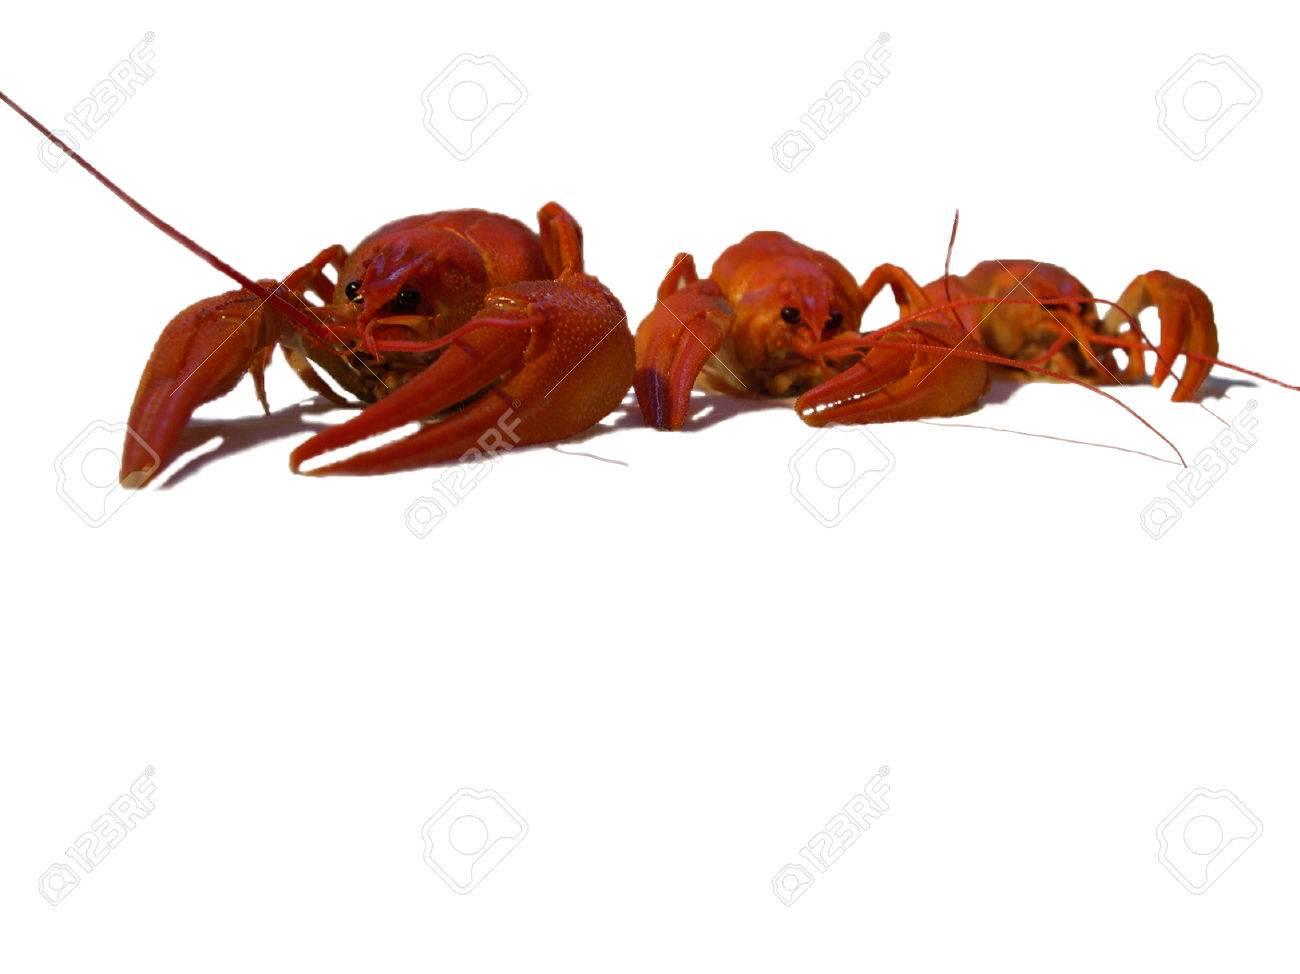 Three big red crayfish on the white backround Stock Photo - 1599784